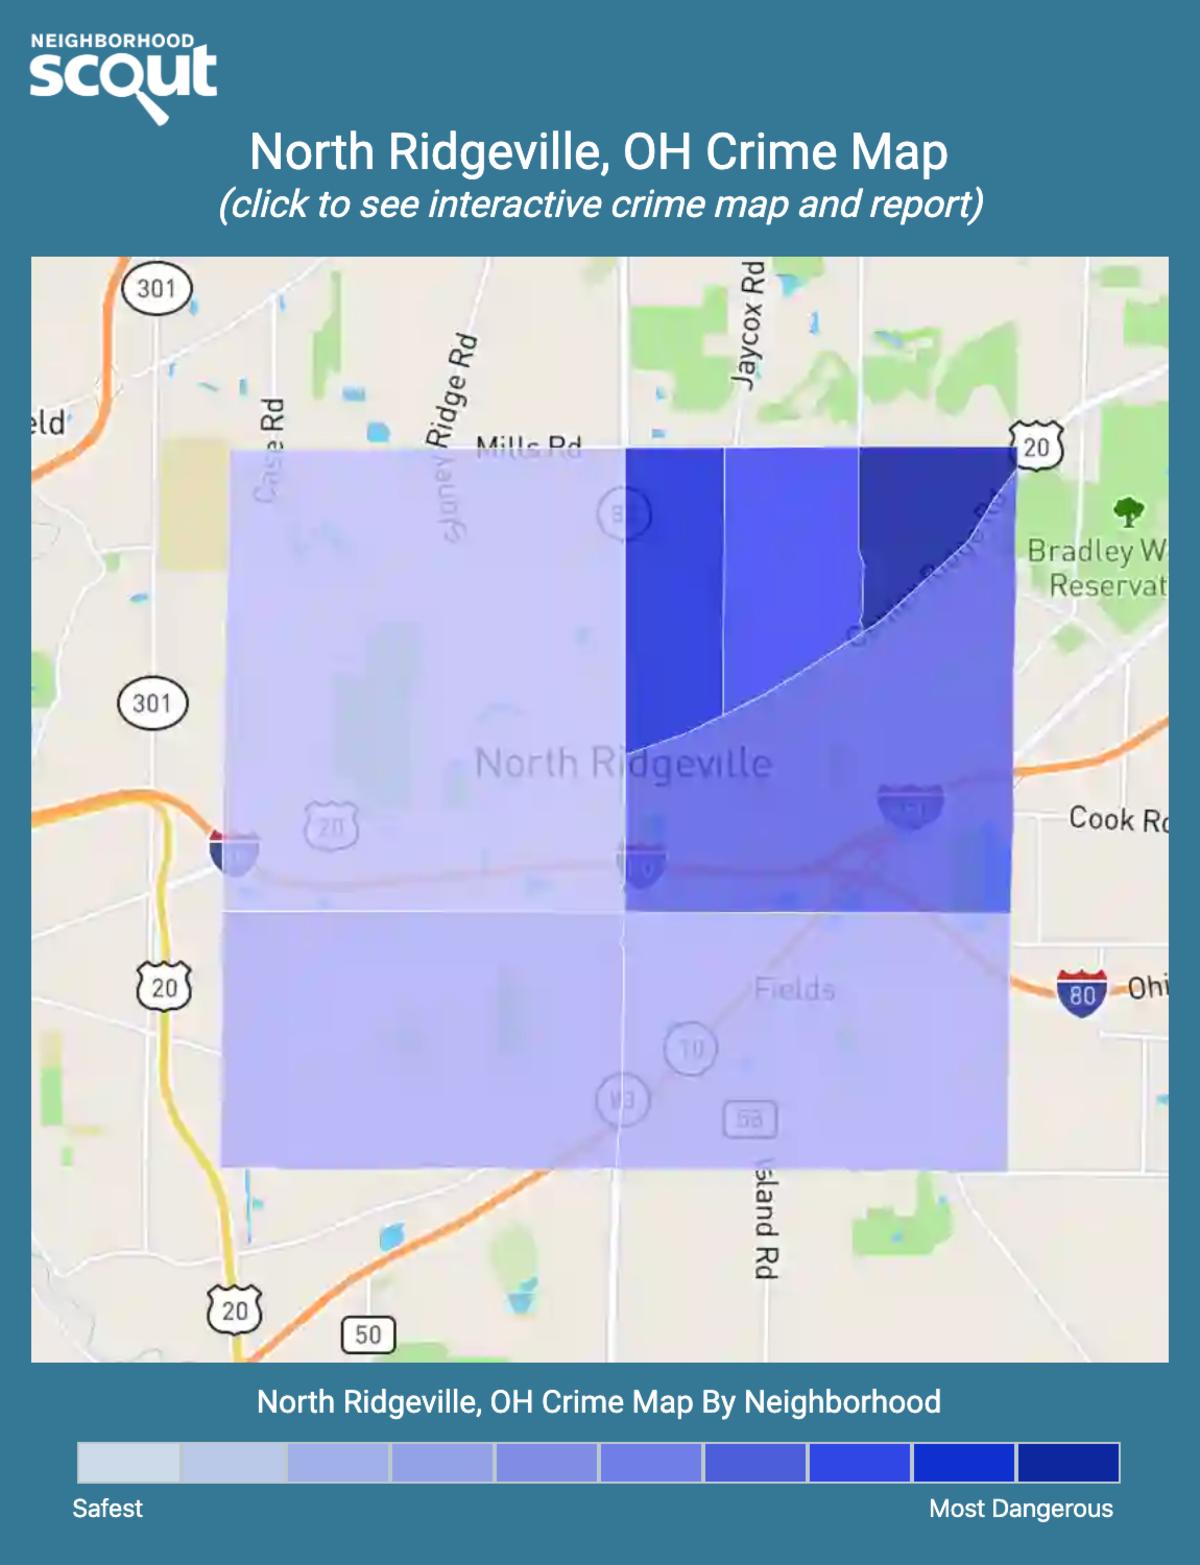 North Ridgeville, Ohio crime map